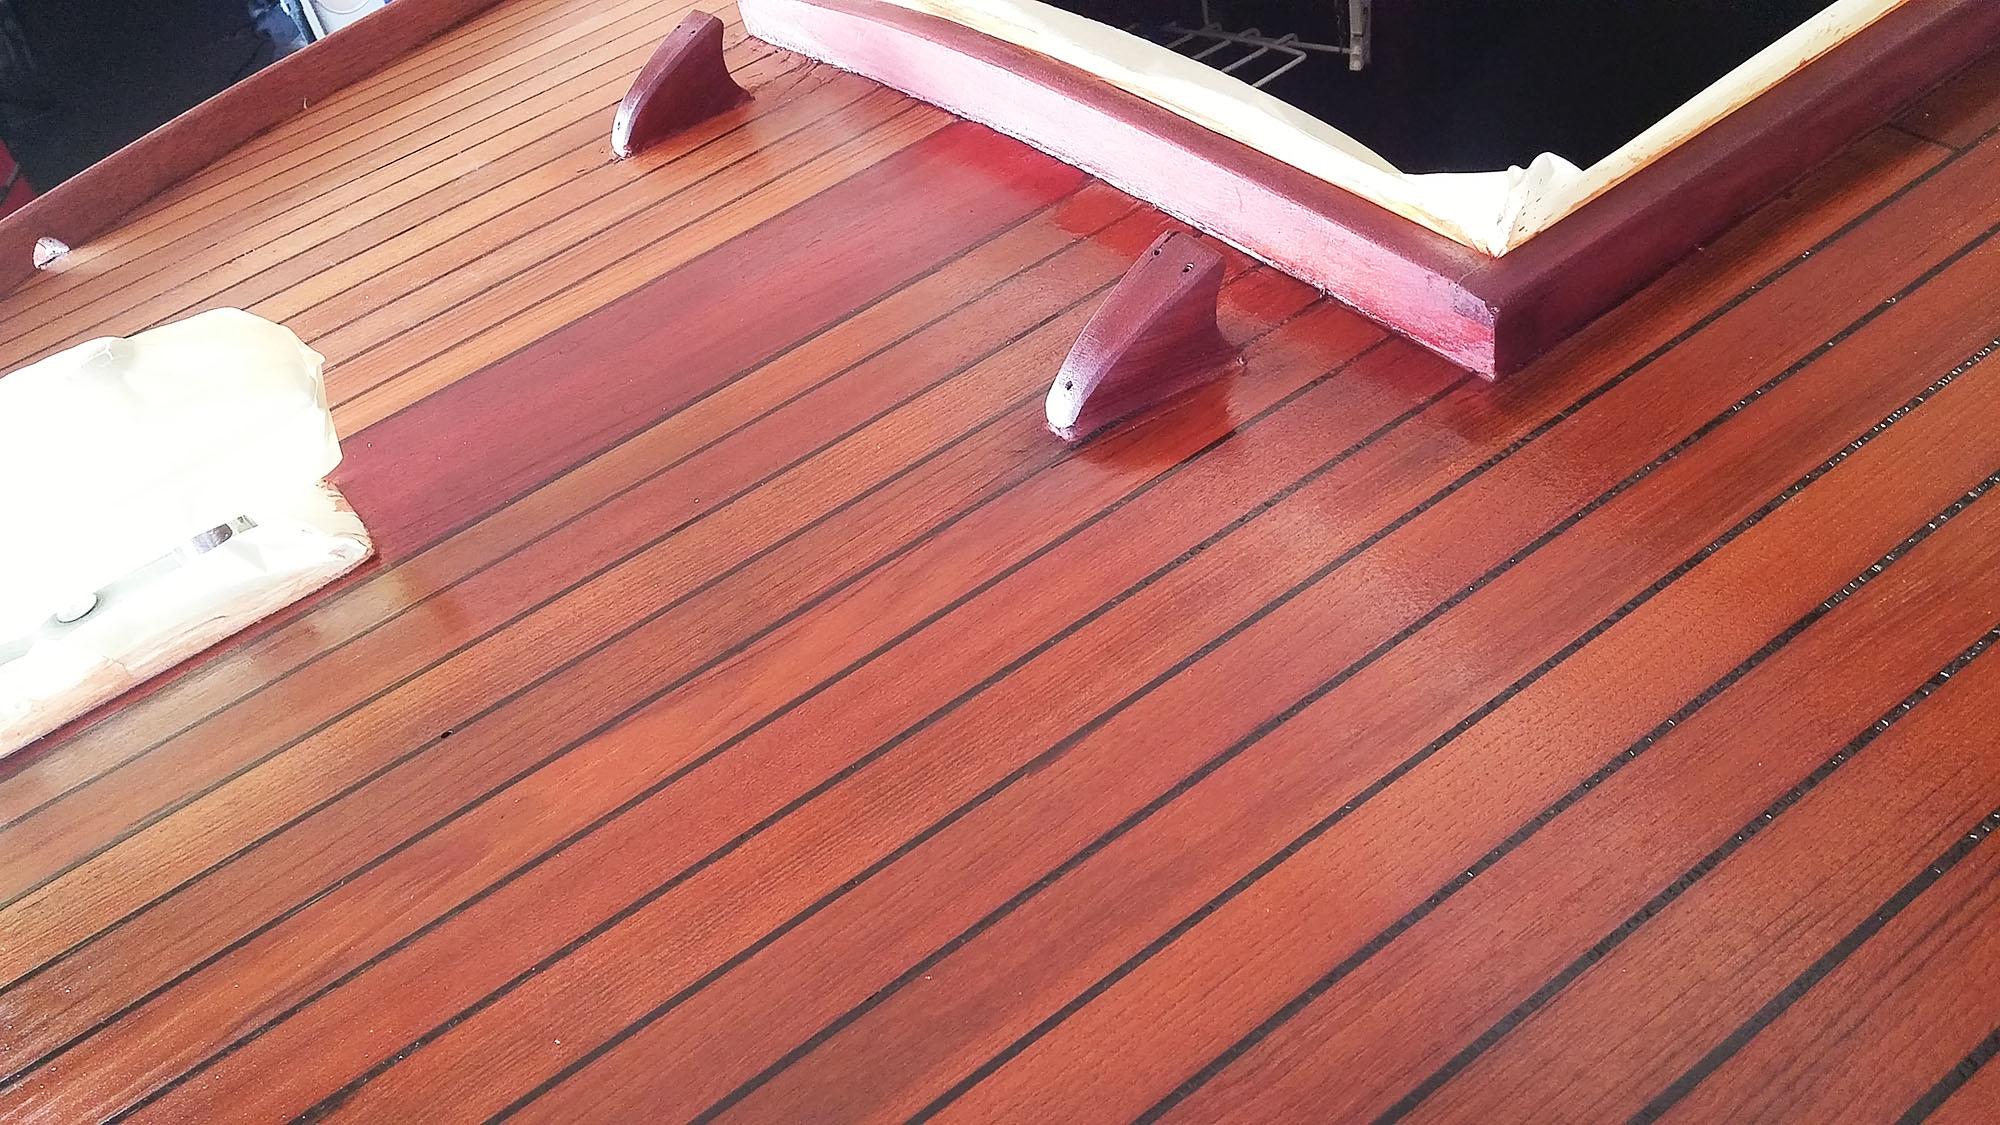 Jachtschilder Friesland-jacht-houten-boot-sloep-Coelan-bootlak-jachtlak-classic-design-yacht-painters3